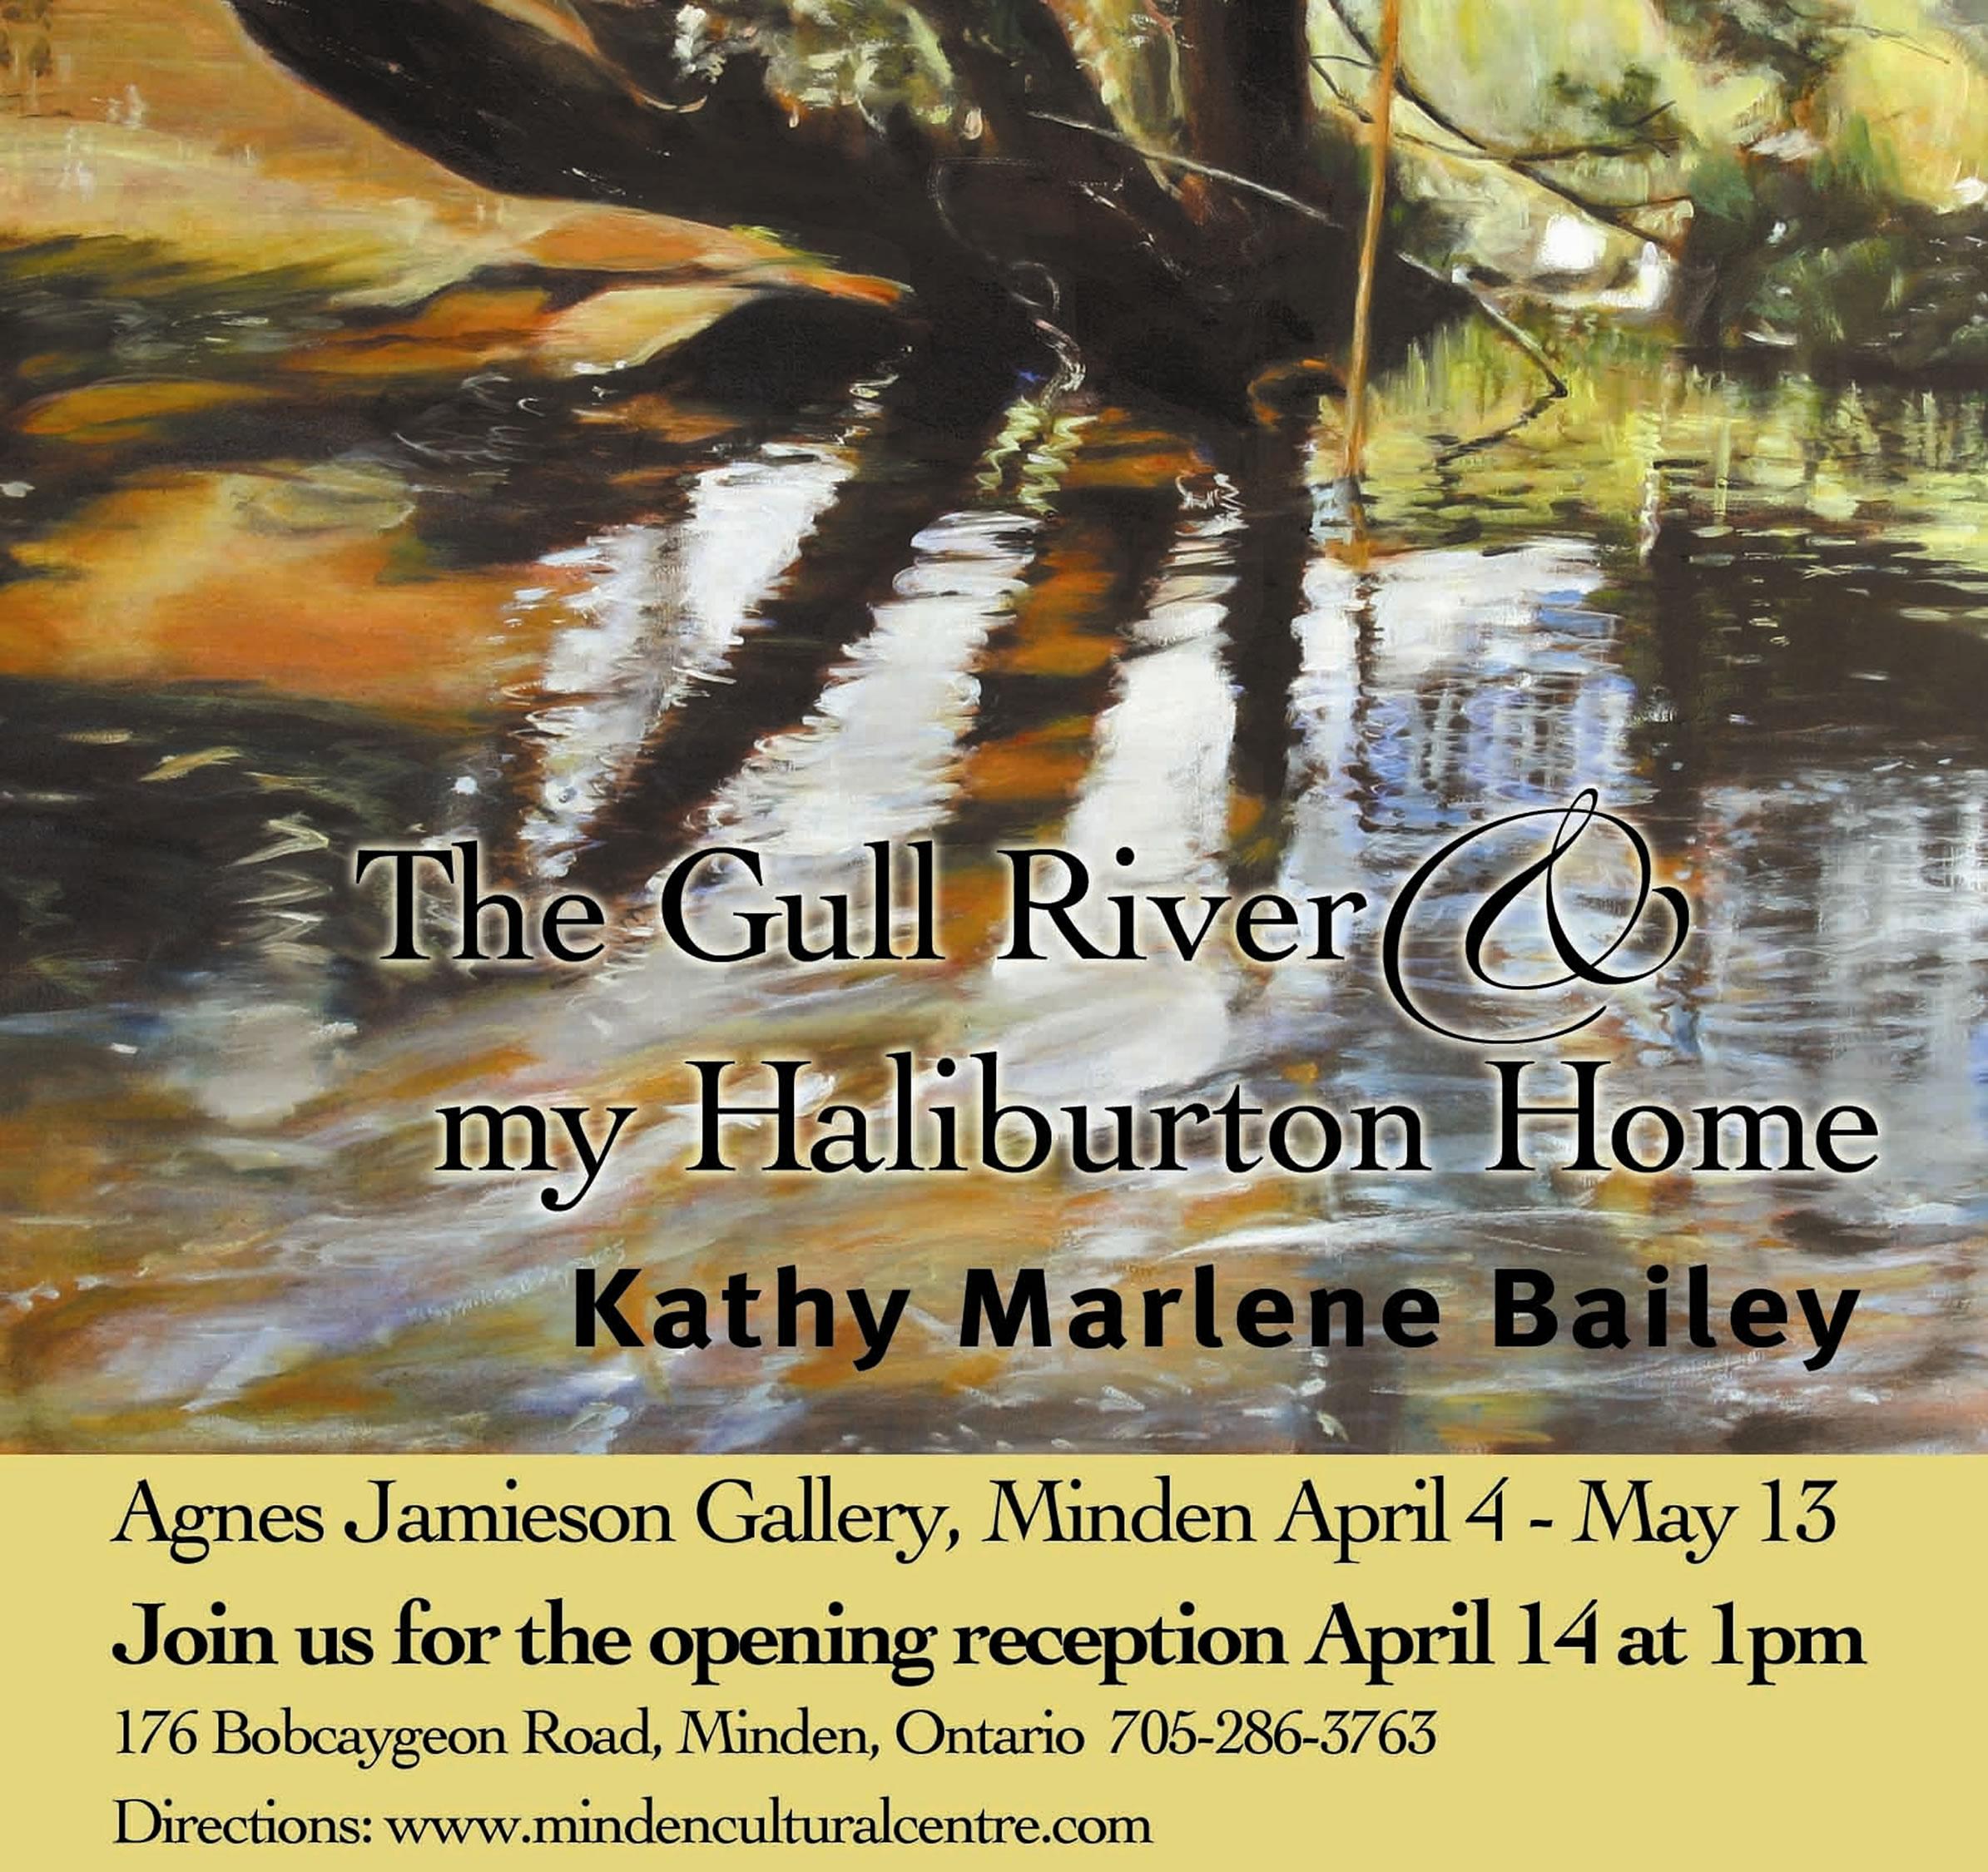 The Gull River, and my Haliburton Home, Kathy Marlene Bailey, Kathy Bailey, Kathy M. Bailey, KM Bailey Agnes Jamieson Gallery, Public Gallery, Minden, Ontario, Canada, Solo Show, Solo  Exhibit.jpg